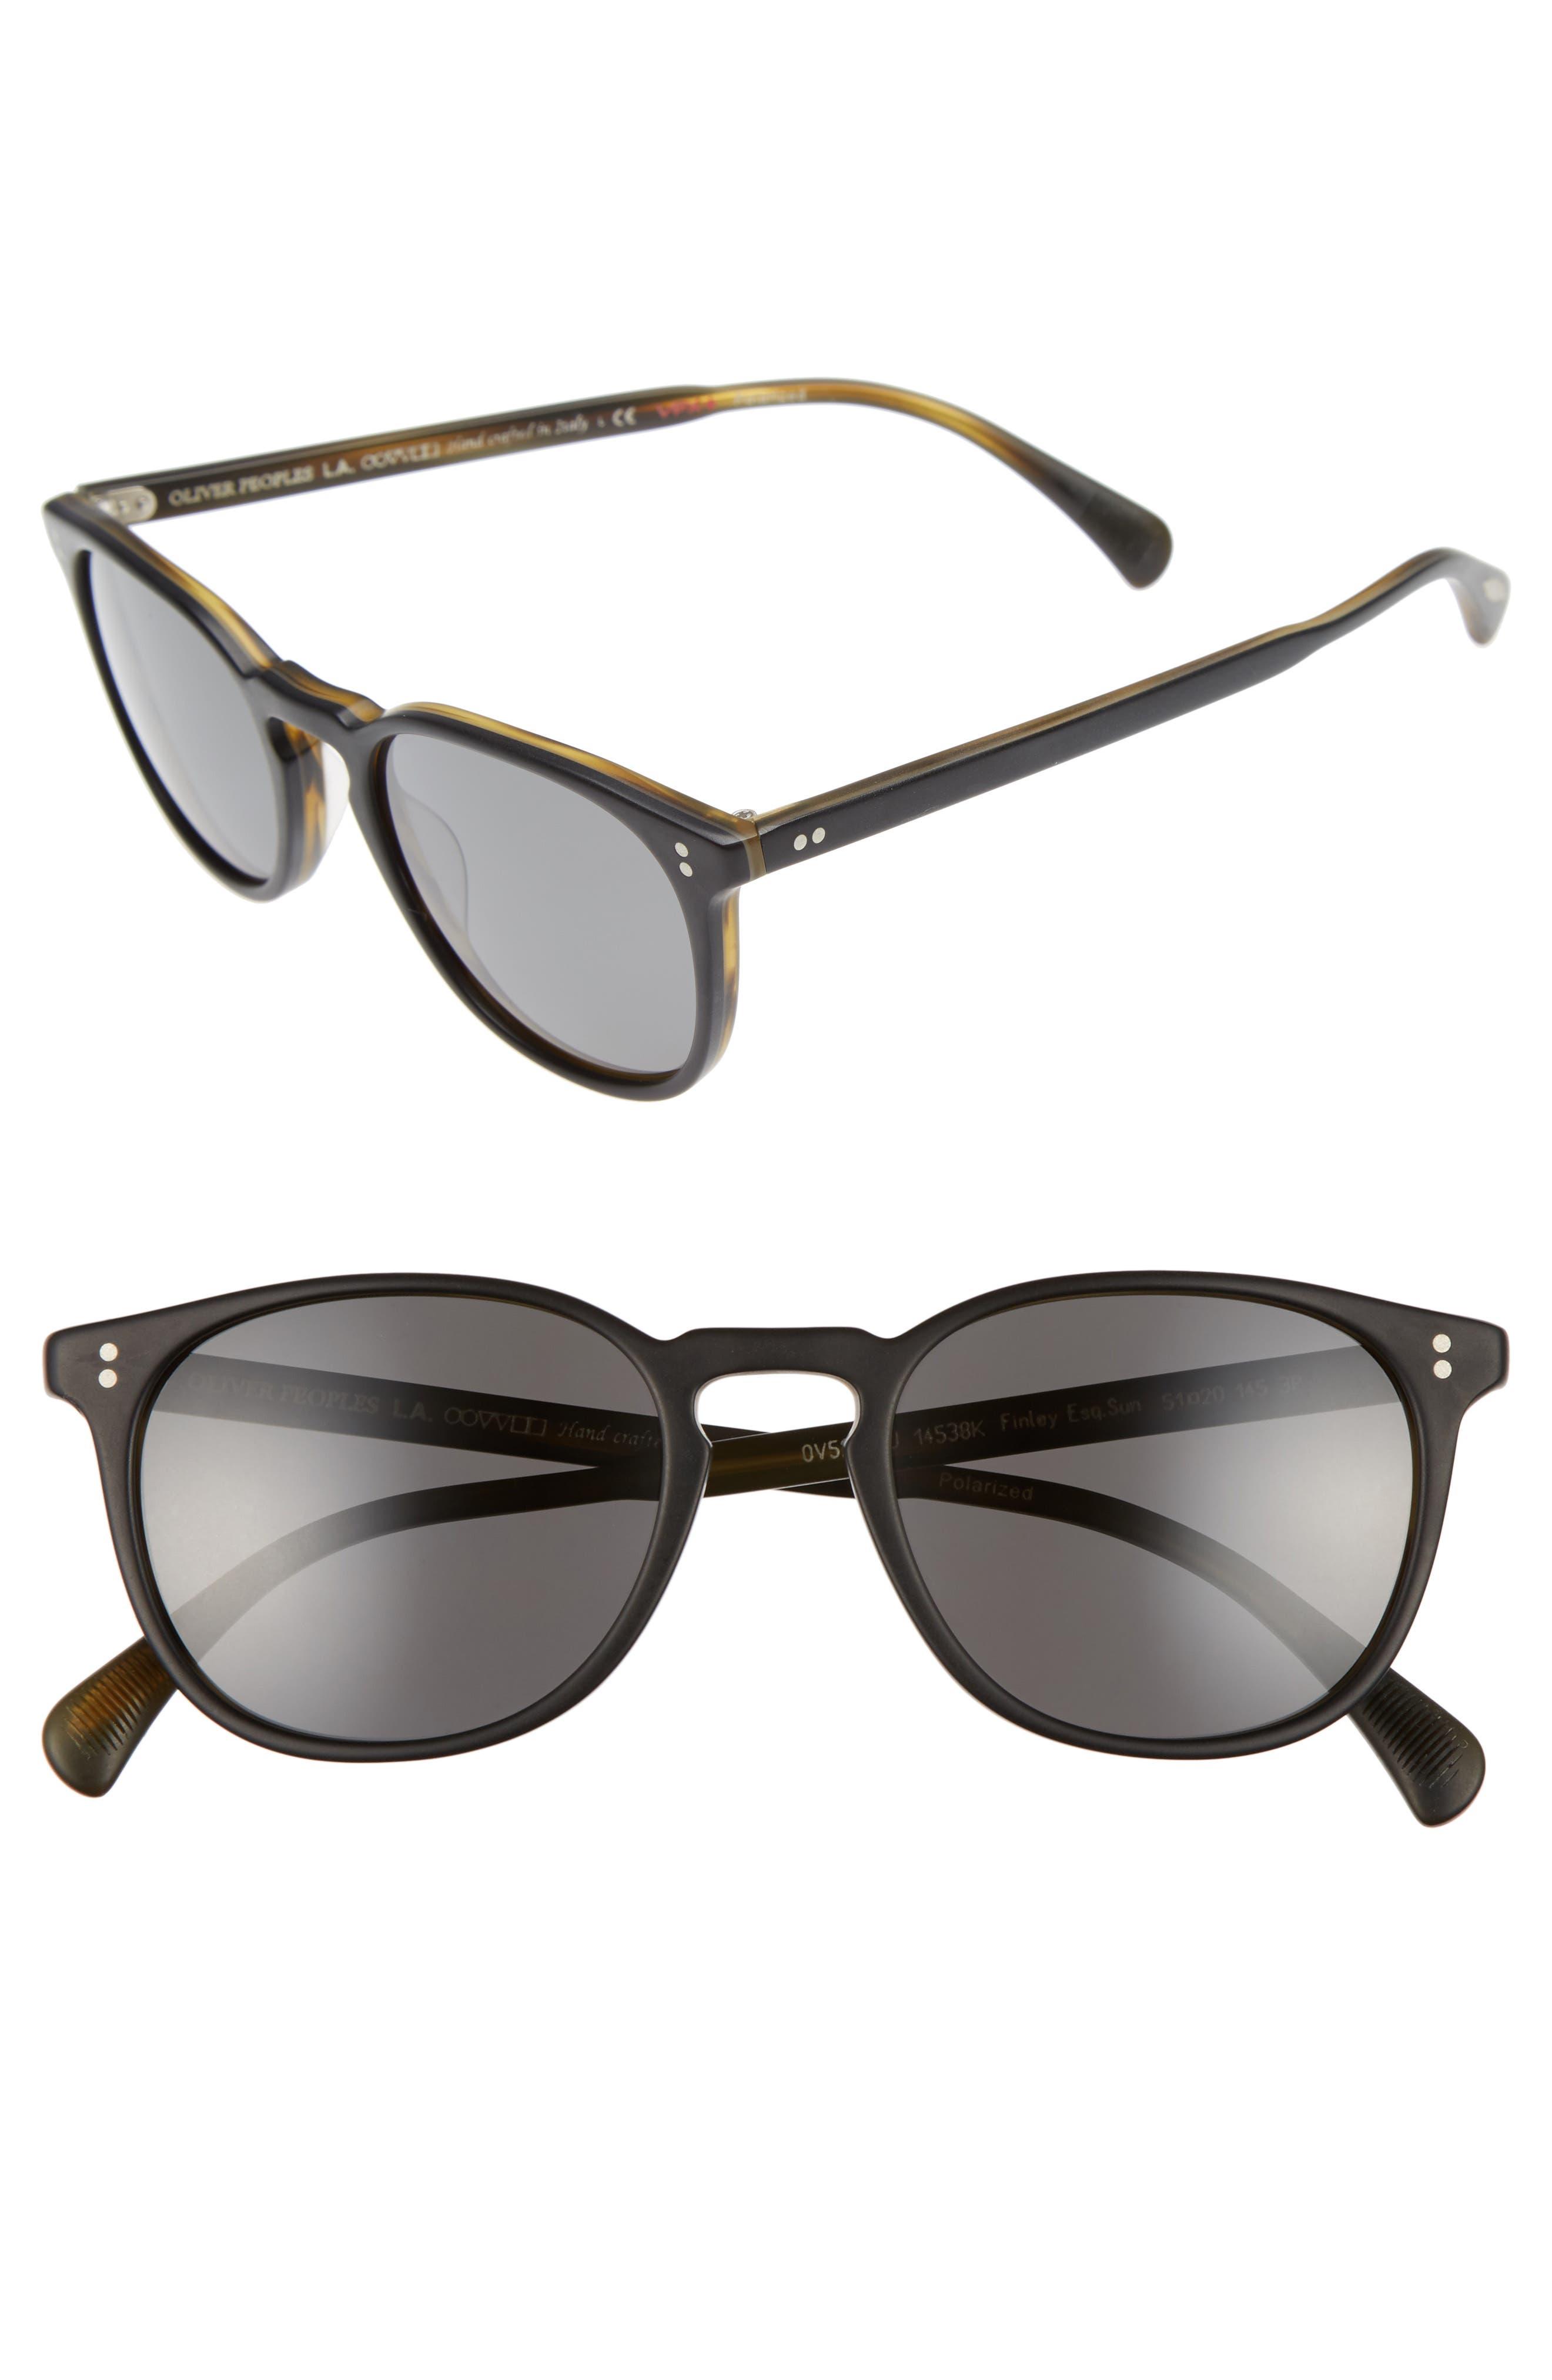 Finley 51mm Retro Polarized Sunglasses,                             Main thumbnail 1, color,                             Black